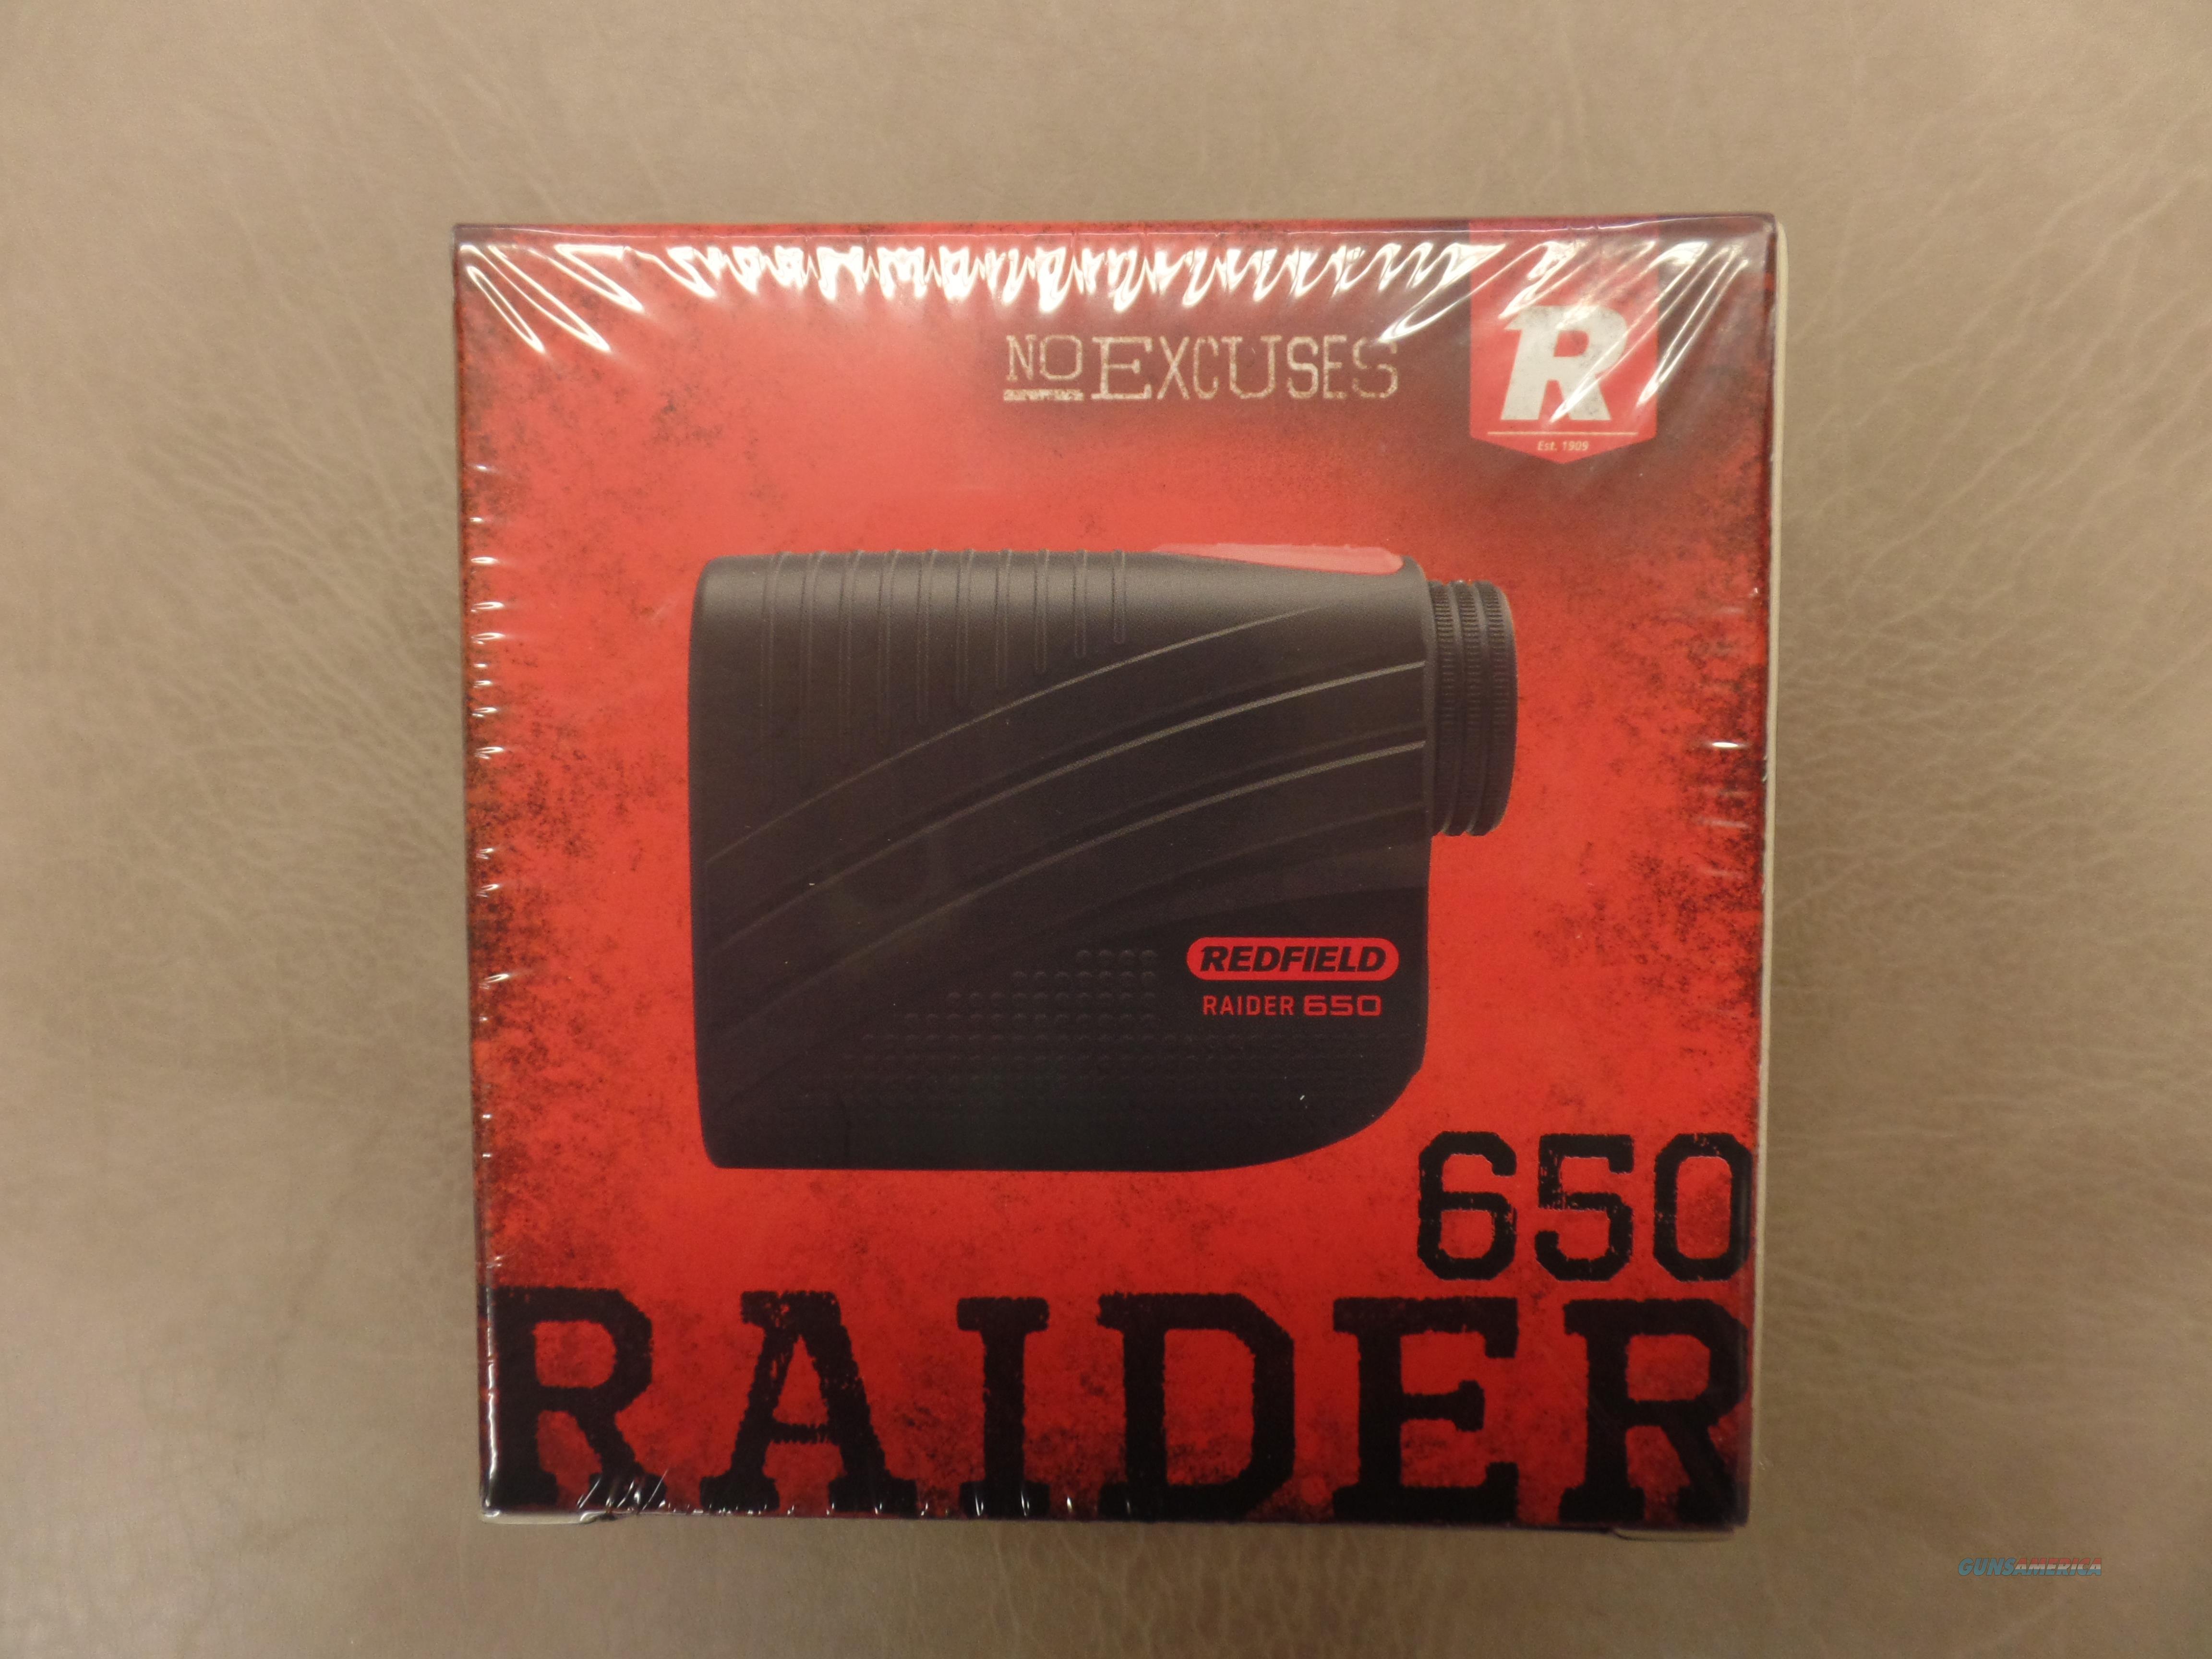 Redfield Raider 650 Digital Laser Rangefinder  Non-Guns > Scopes/Mounts/Rings & Optics > Non-Scope Optics > Rangefinders